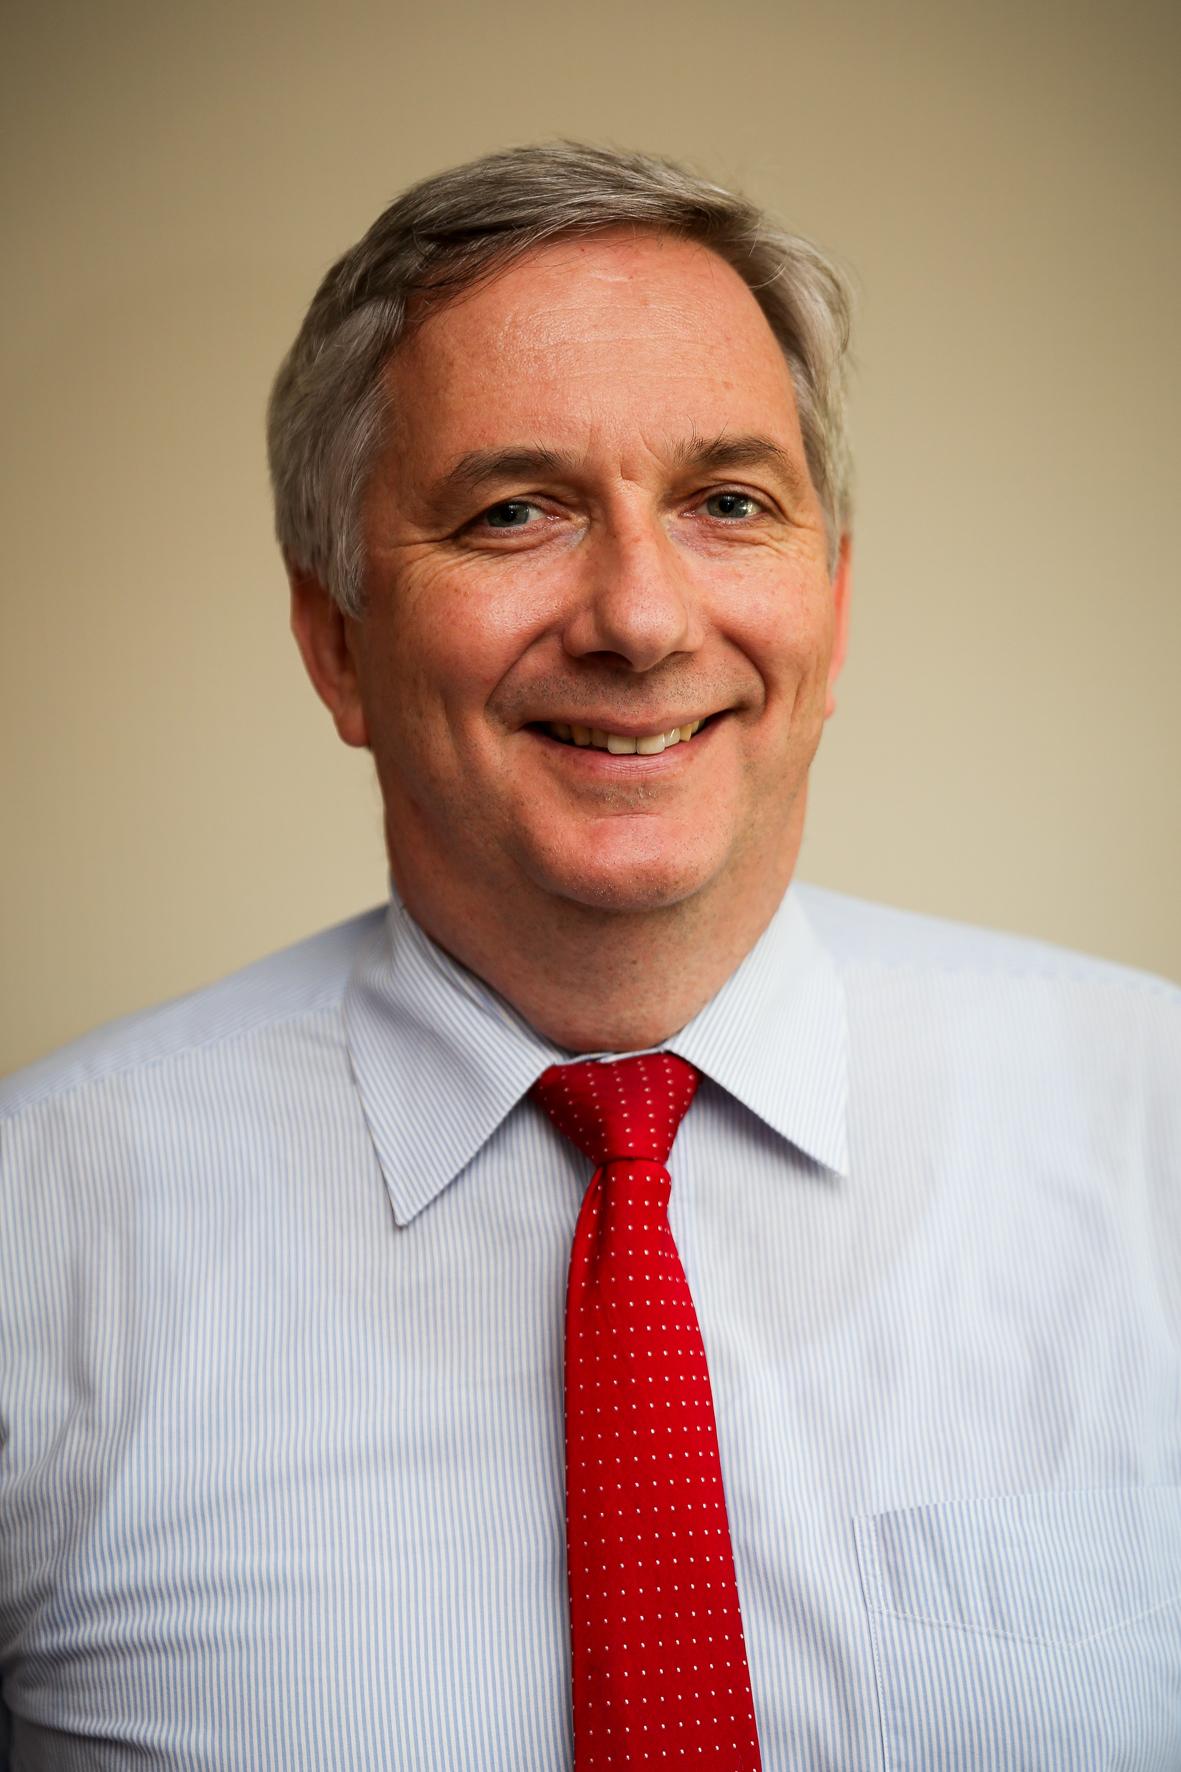 Prof. Dr. Rüdiger Deike